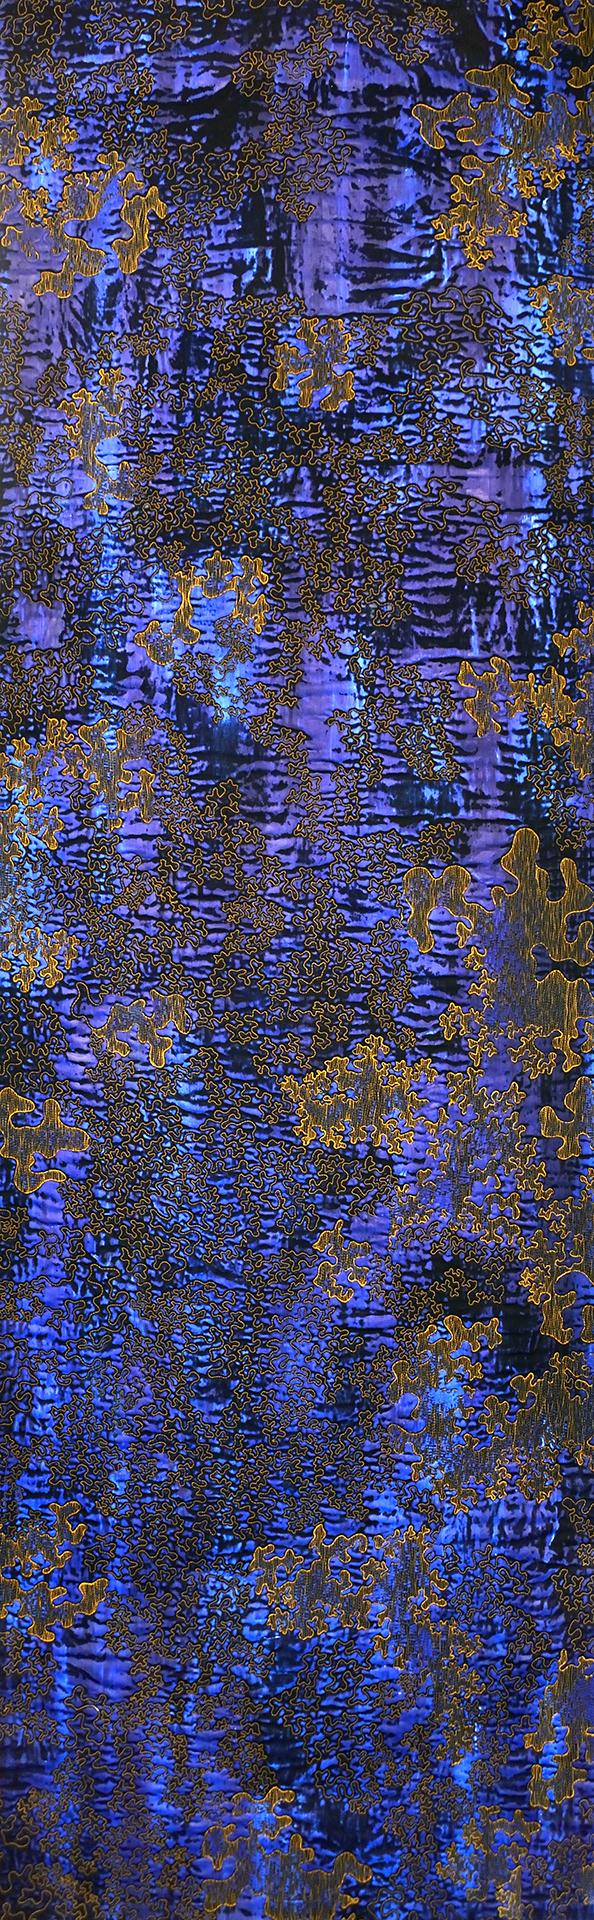 Struktur Blau 2, 2016, 199,5 x 62,5 cm